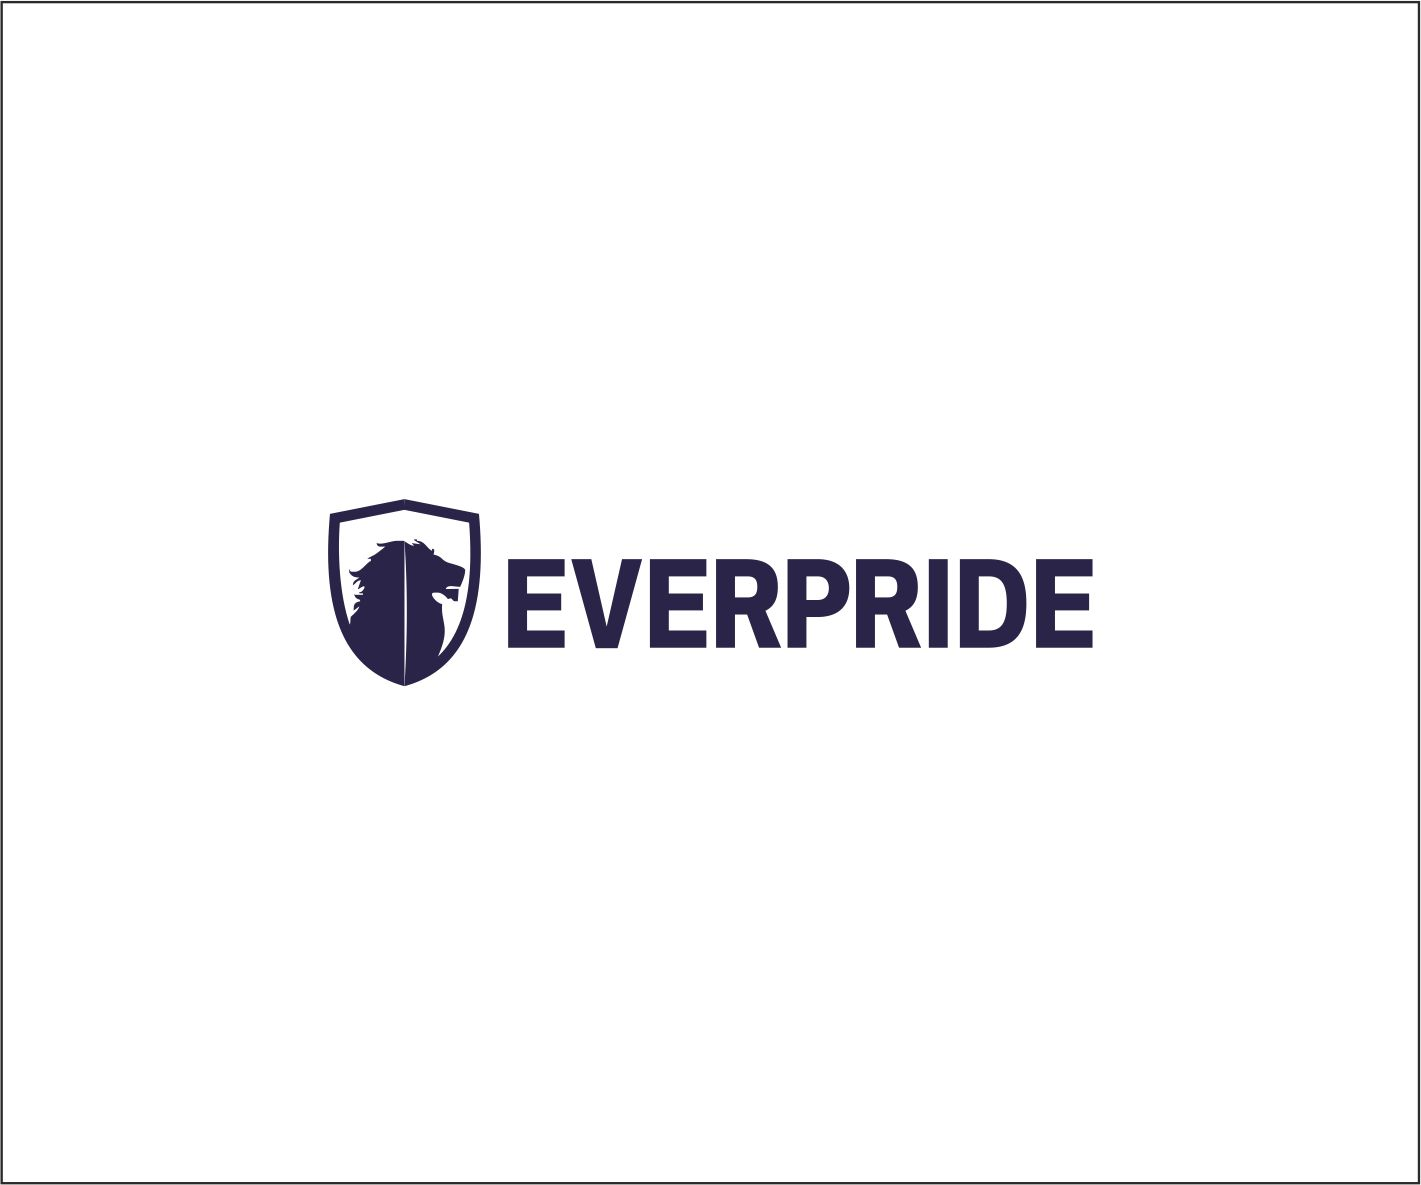 74 Professional Logo Designs for EVERPRIDE a business in Peru